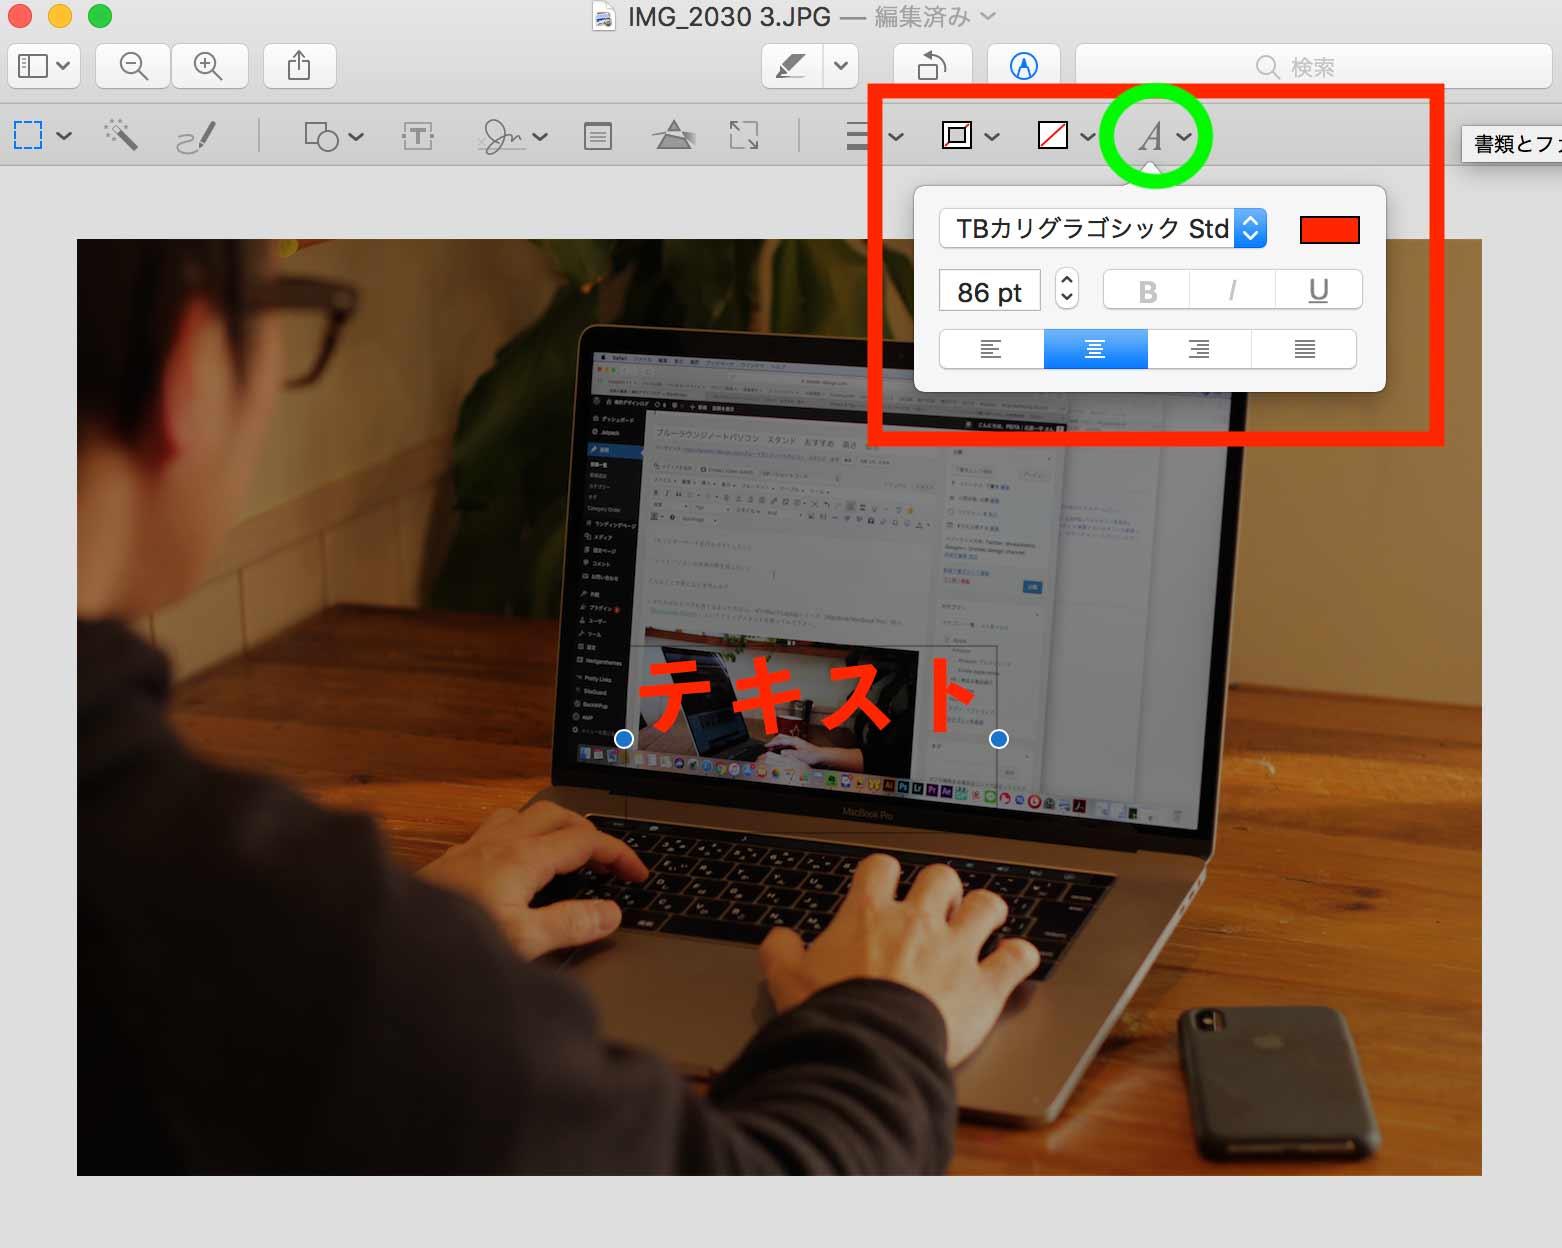 Macプレビュー編集画面でテキストの色やサイズを調整した画像